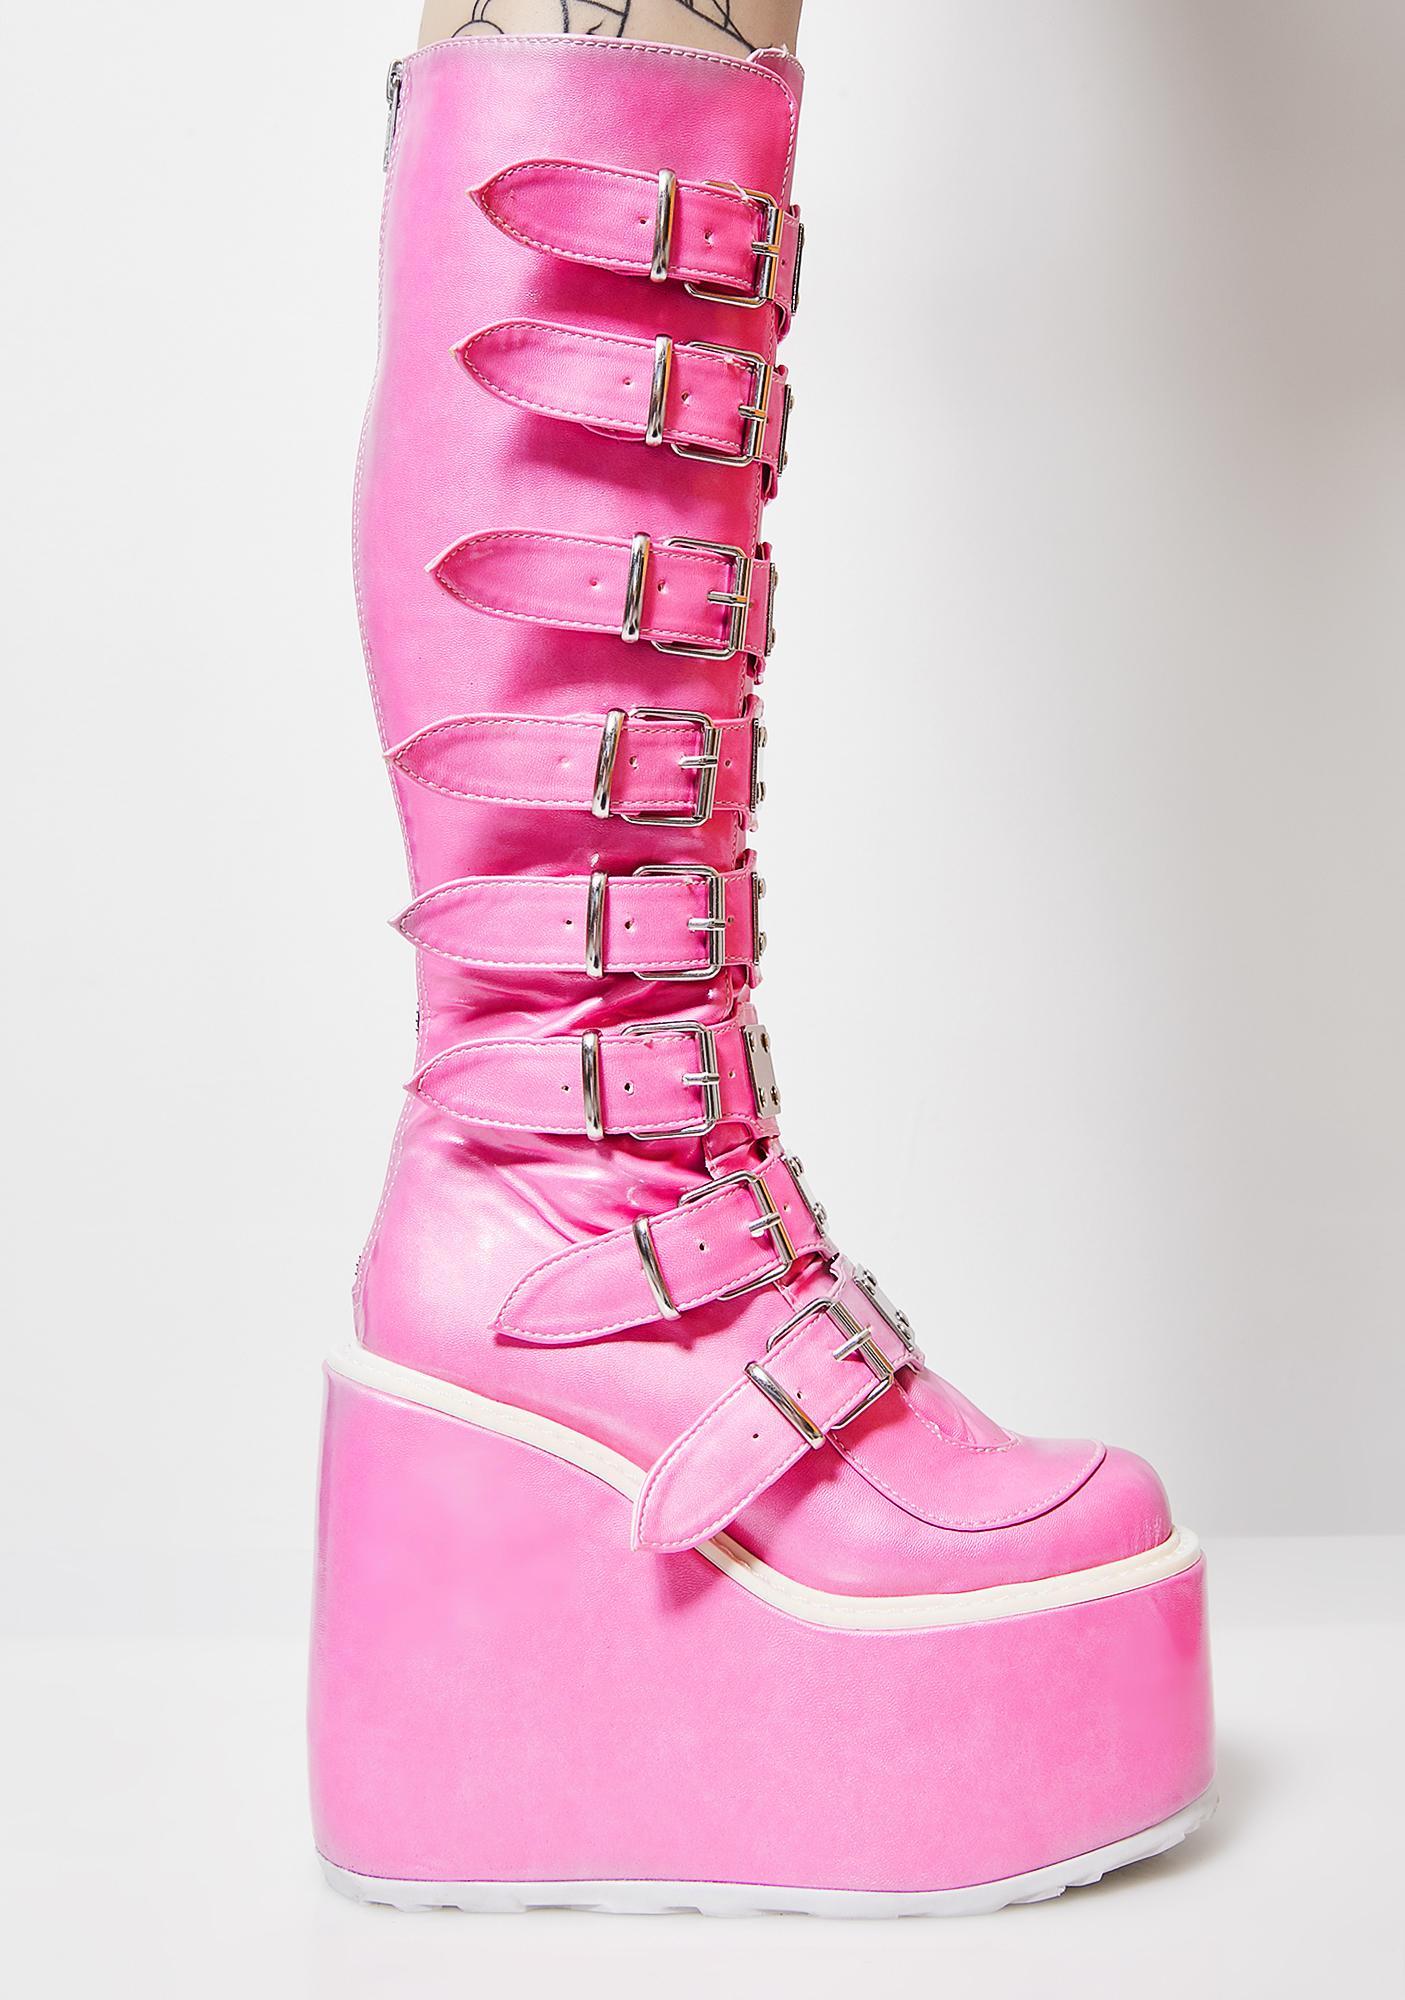 Demonia Sweeter Than Eva Trinity Boots